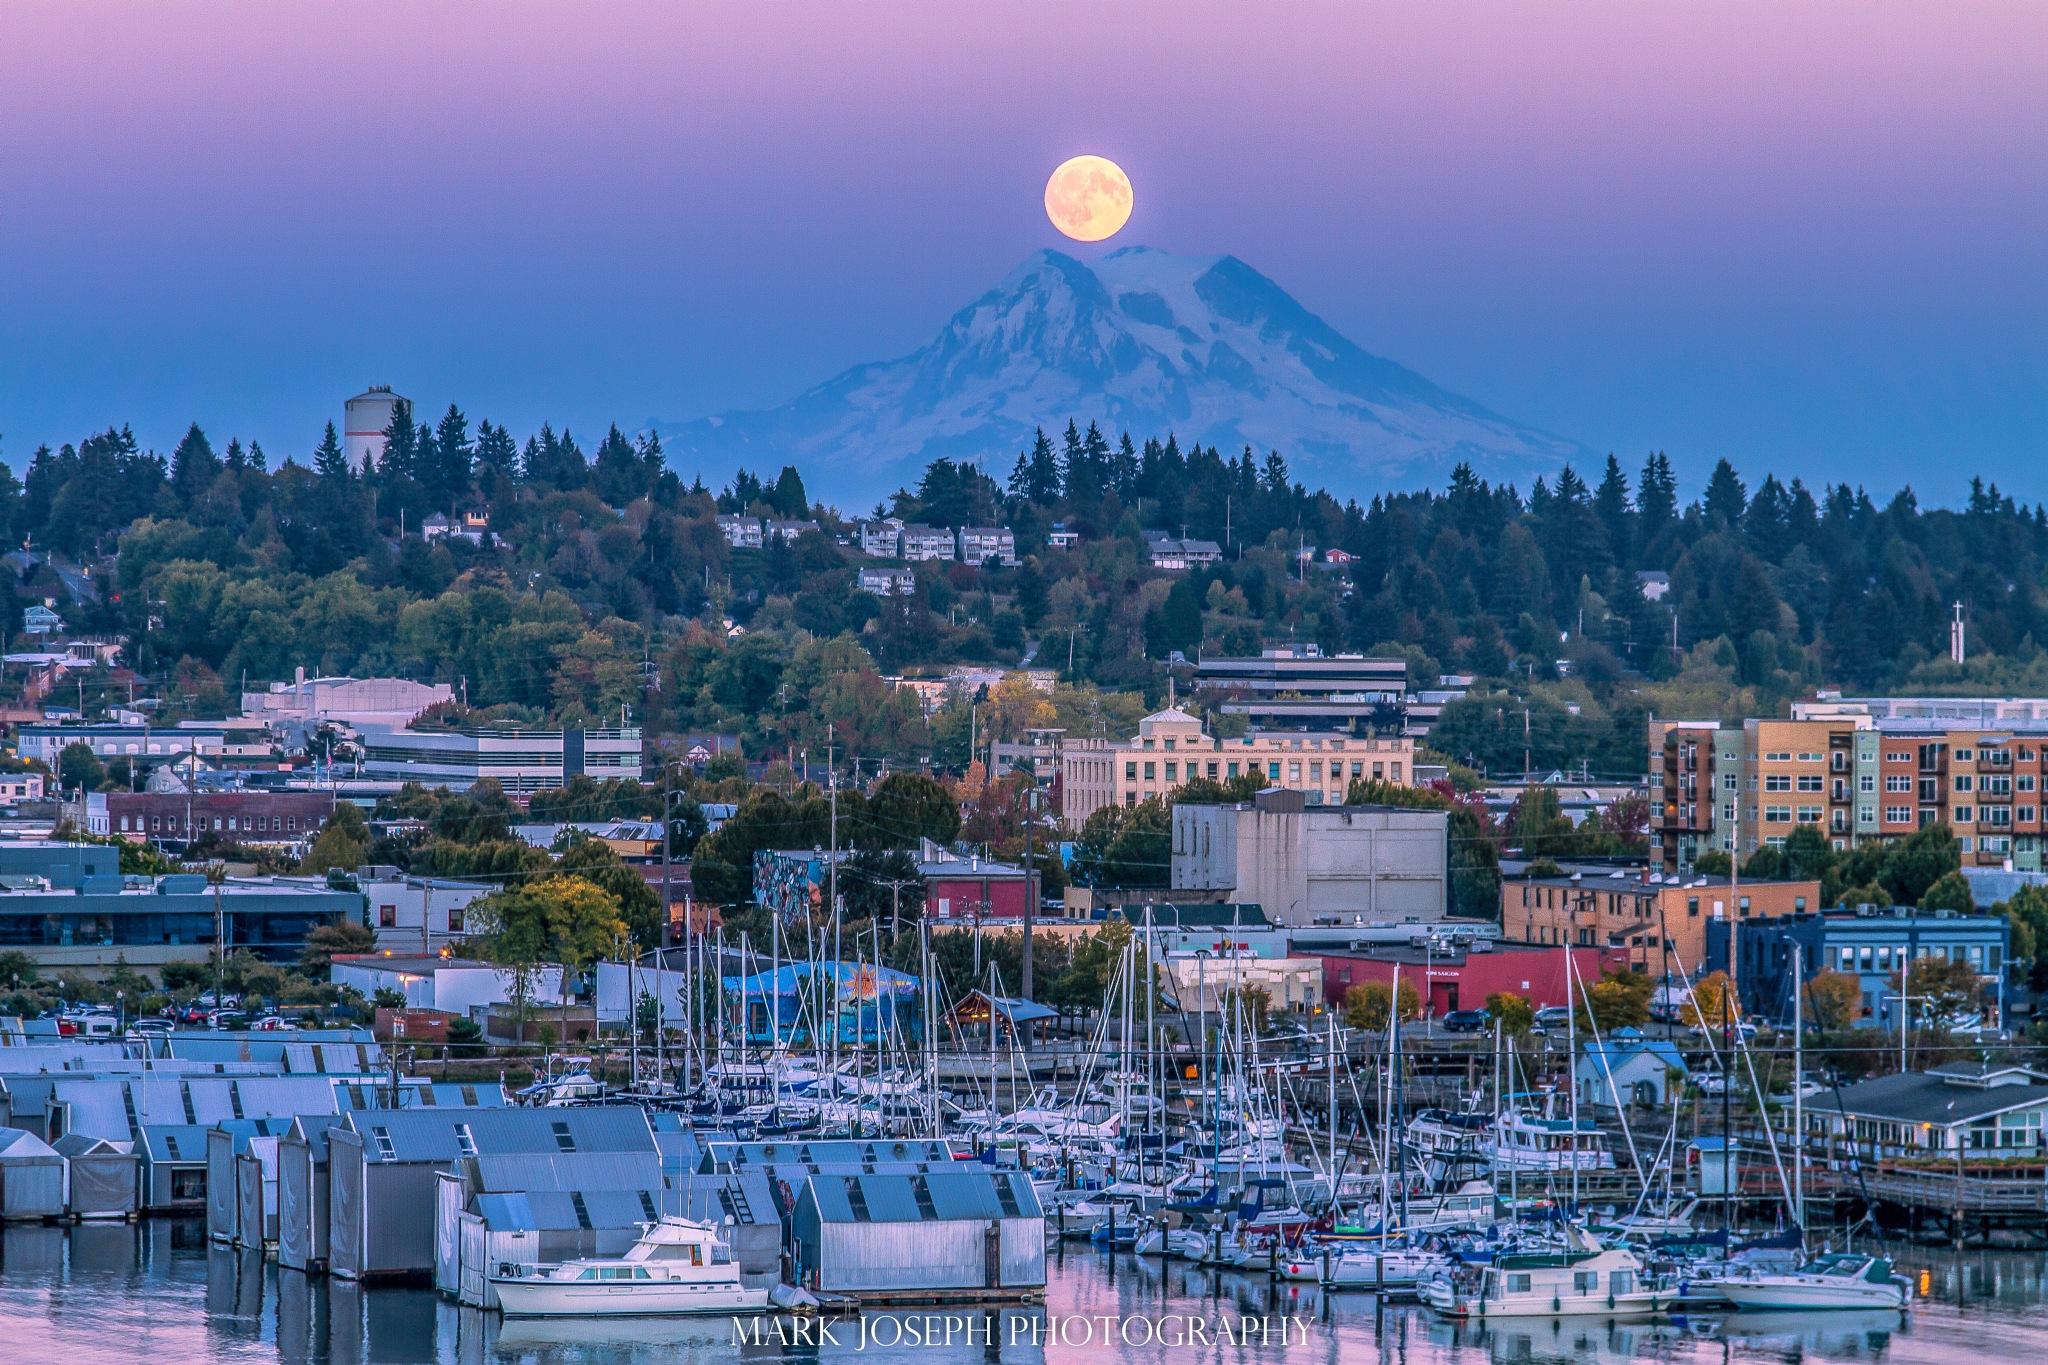 Moon over Mt. Rainier and Olympia by Mark Joseph